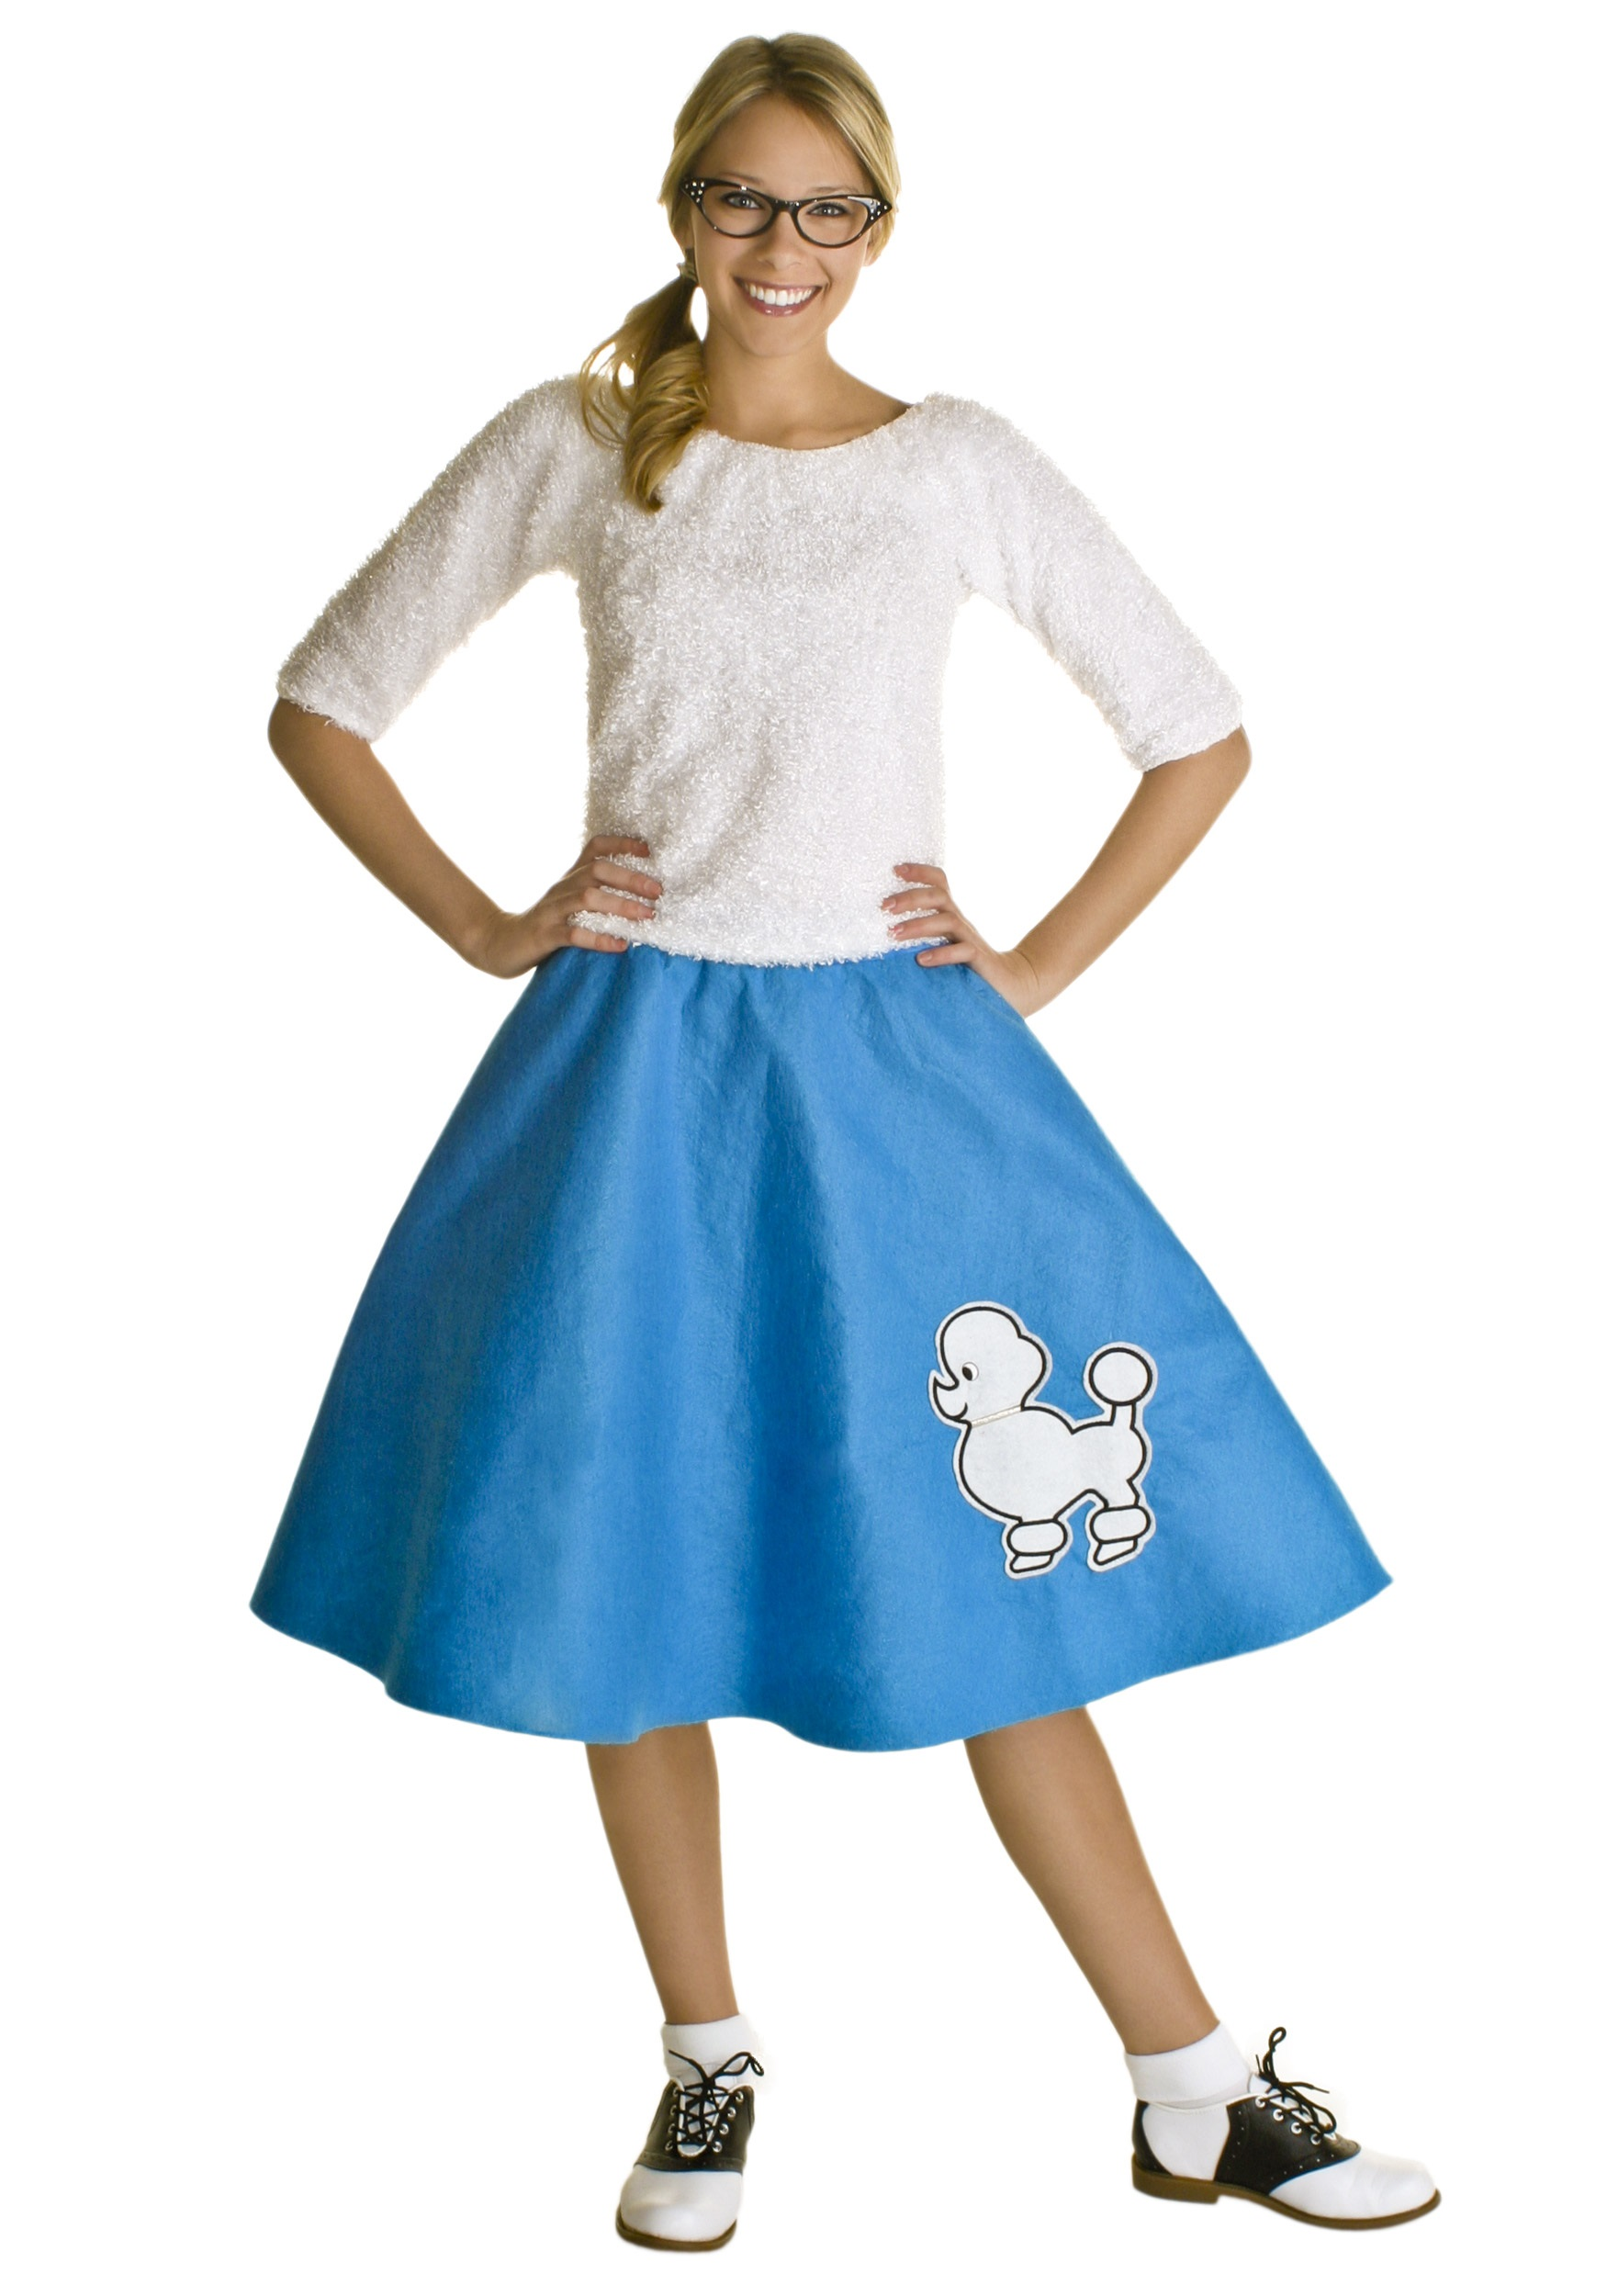 Adult Blue 50s Poodle Skirt  sc 1 st  Halloween Costumes & Adult Blue 50s Poodle Skirt - Halloween Costumes